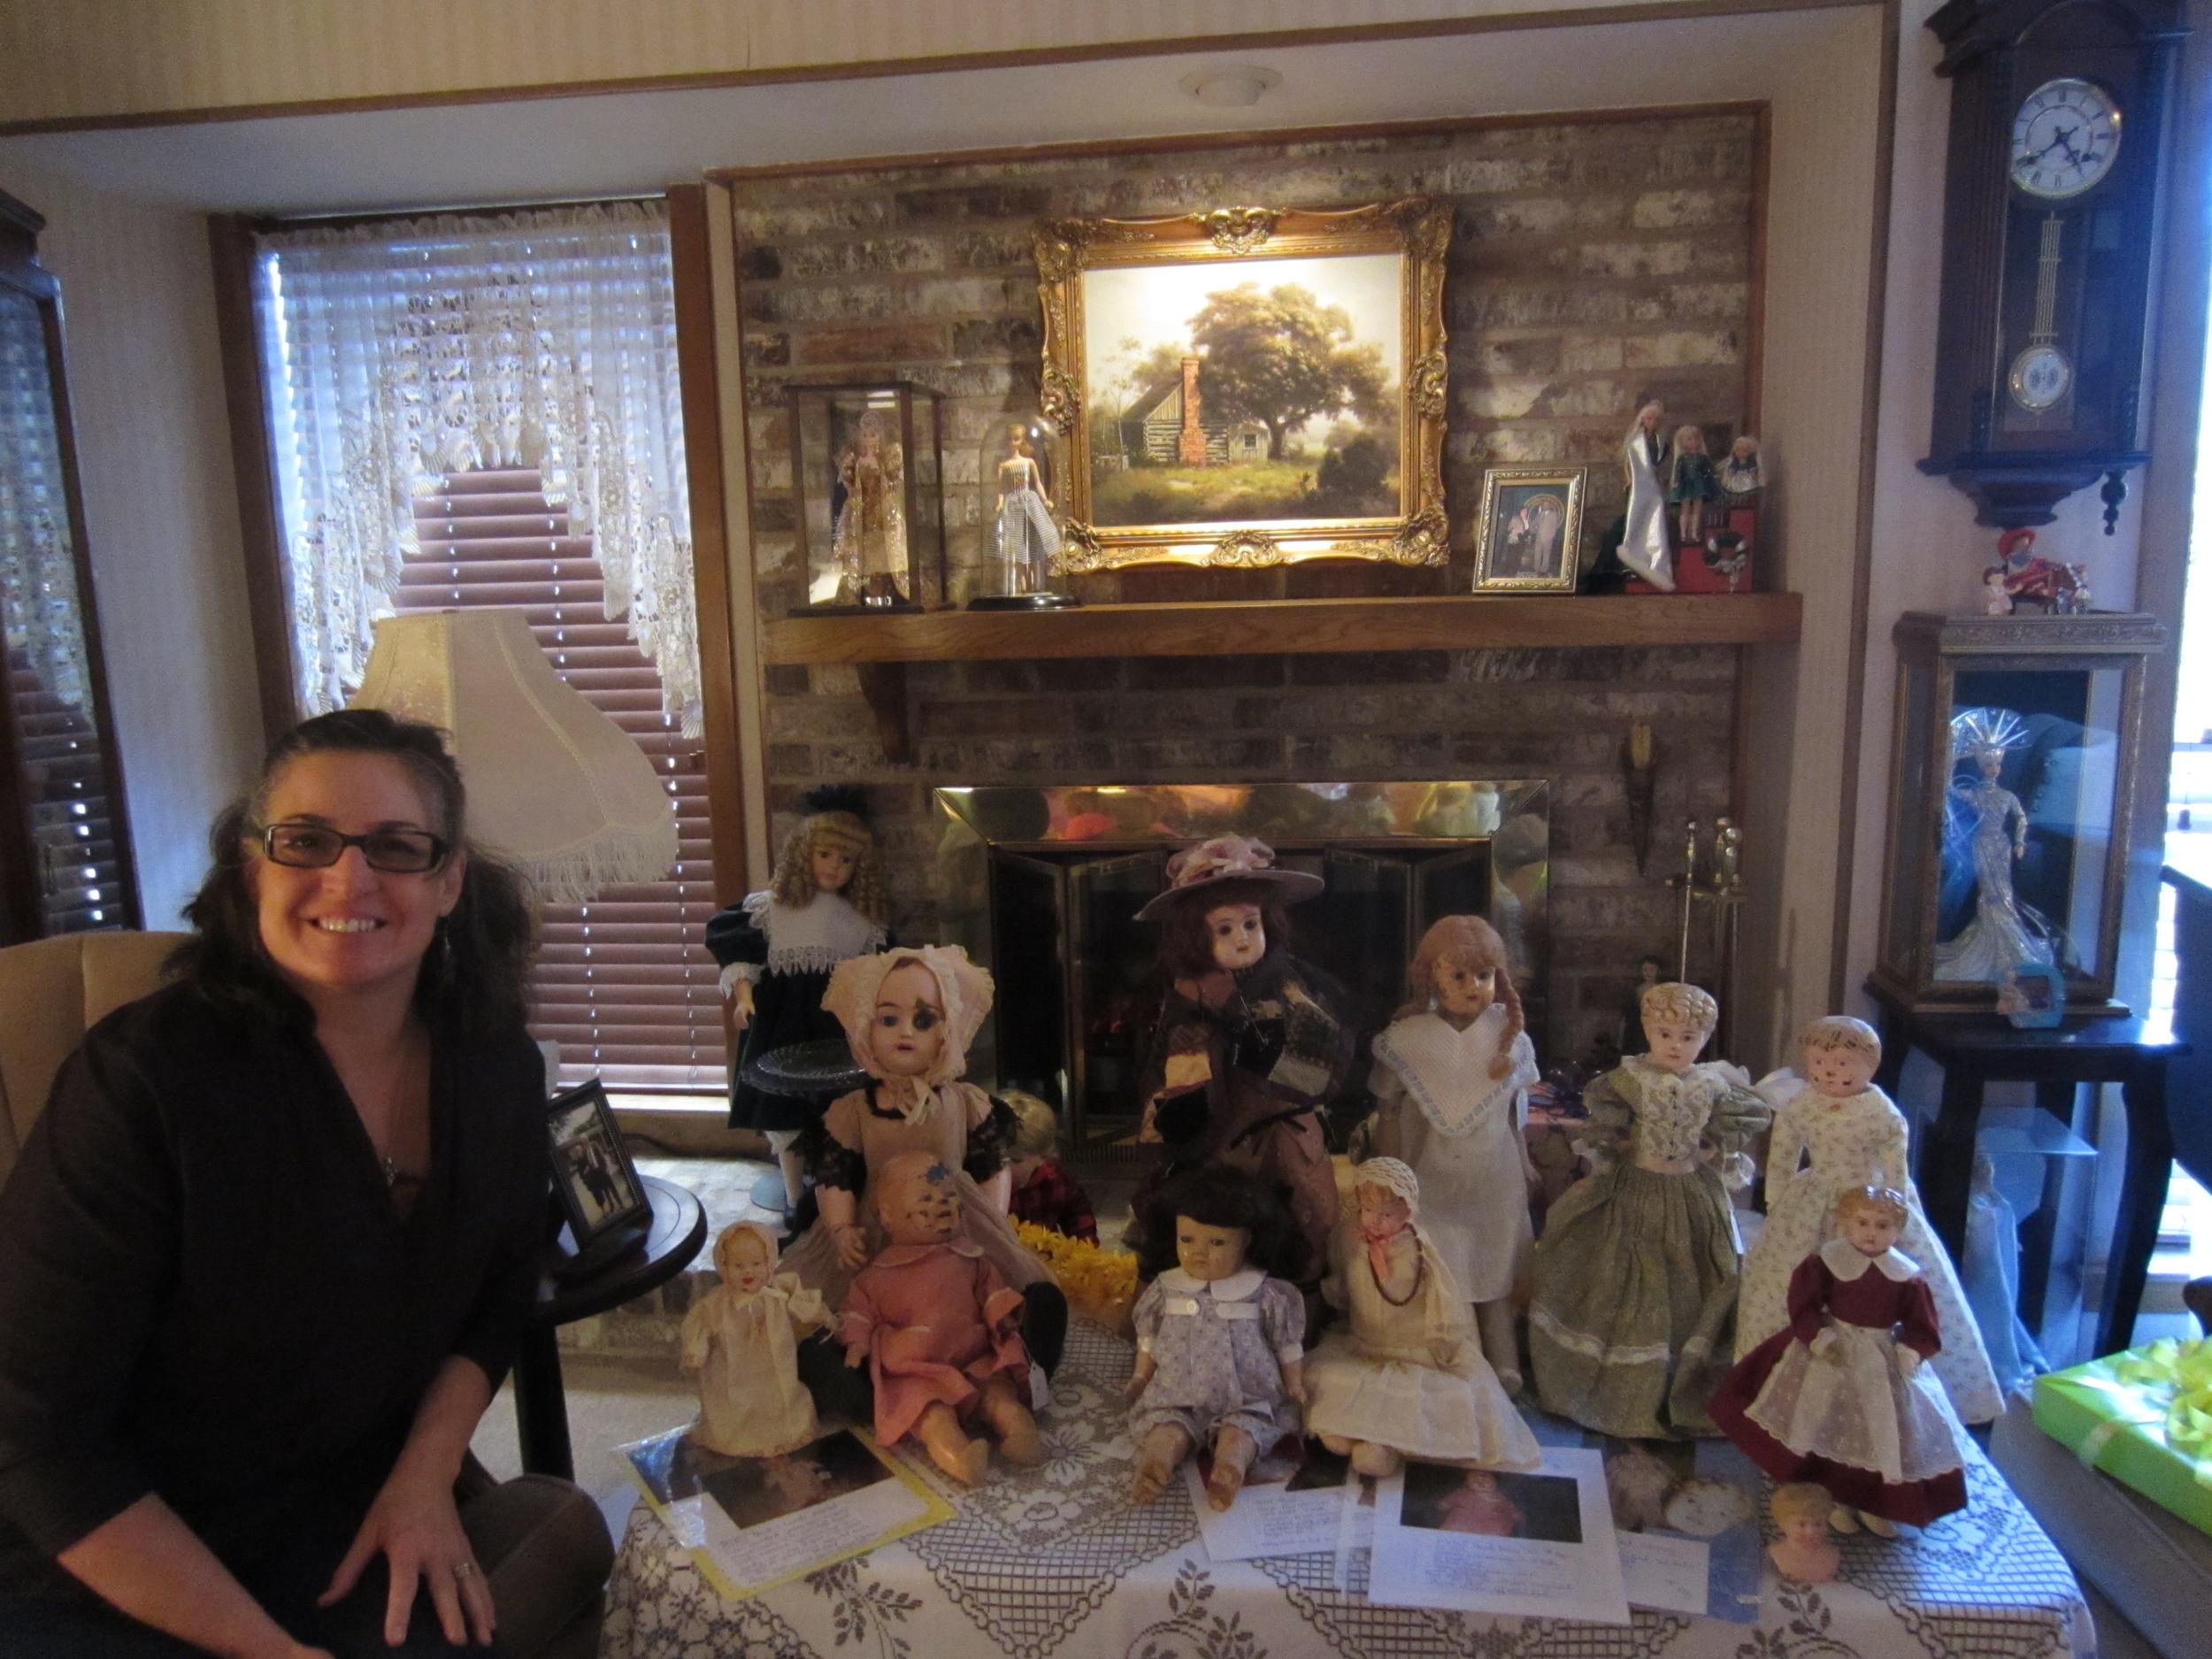 In January Mia presented the program on Metal Head dolls.